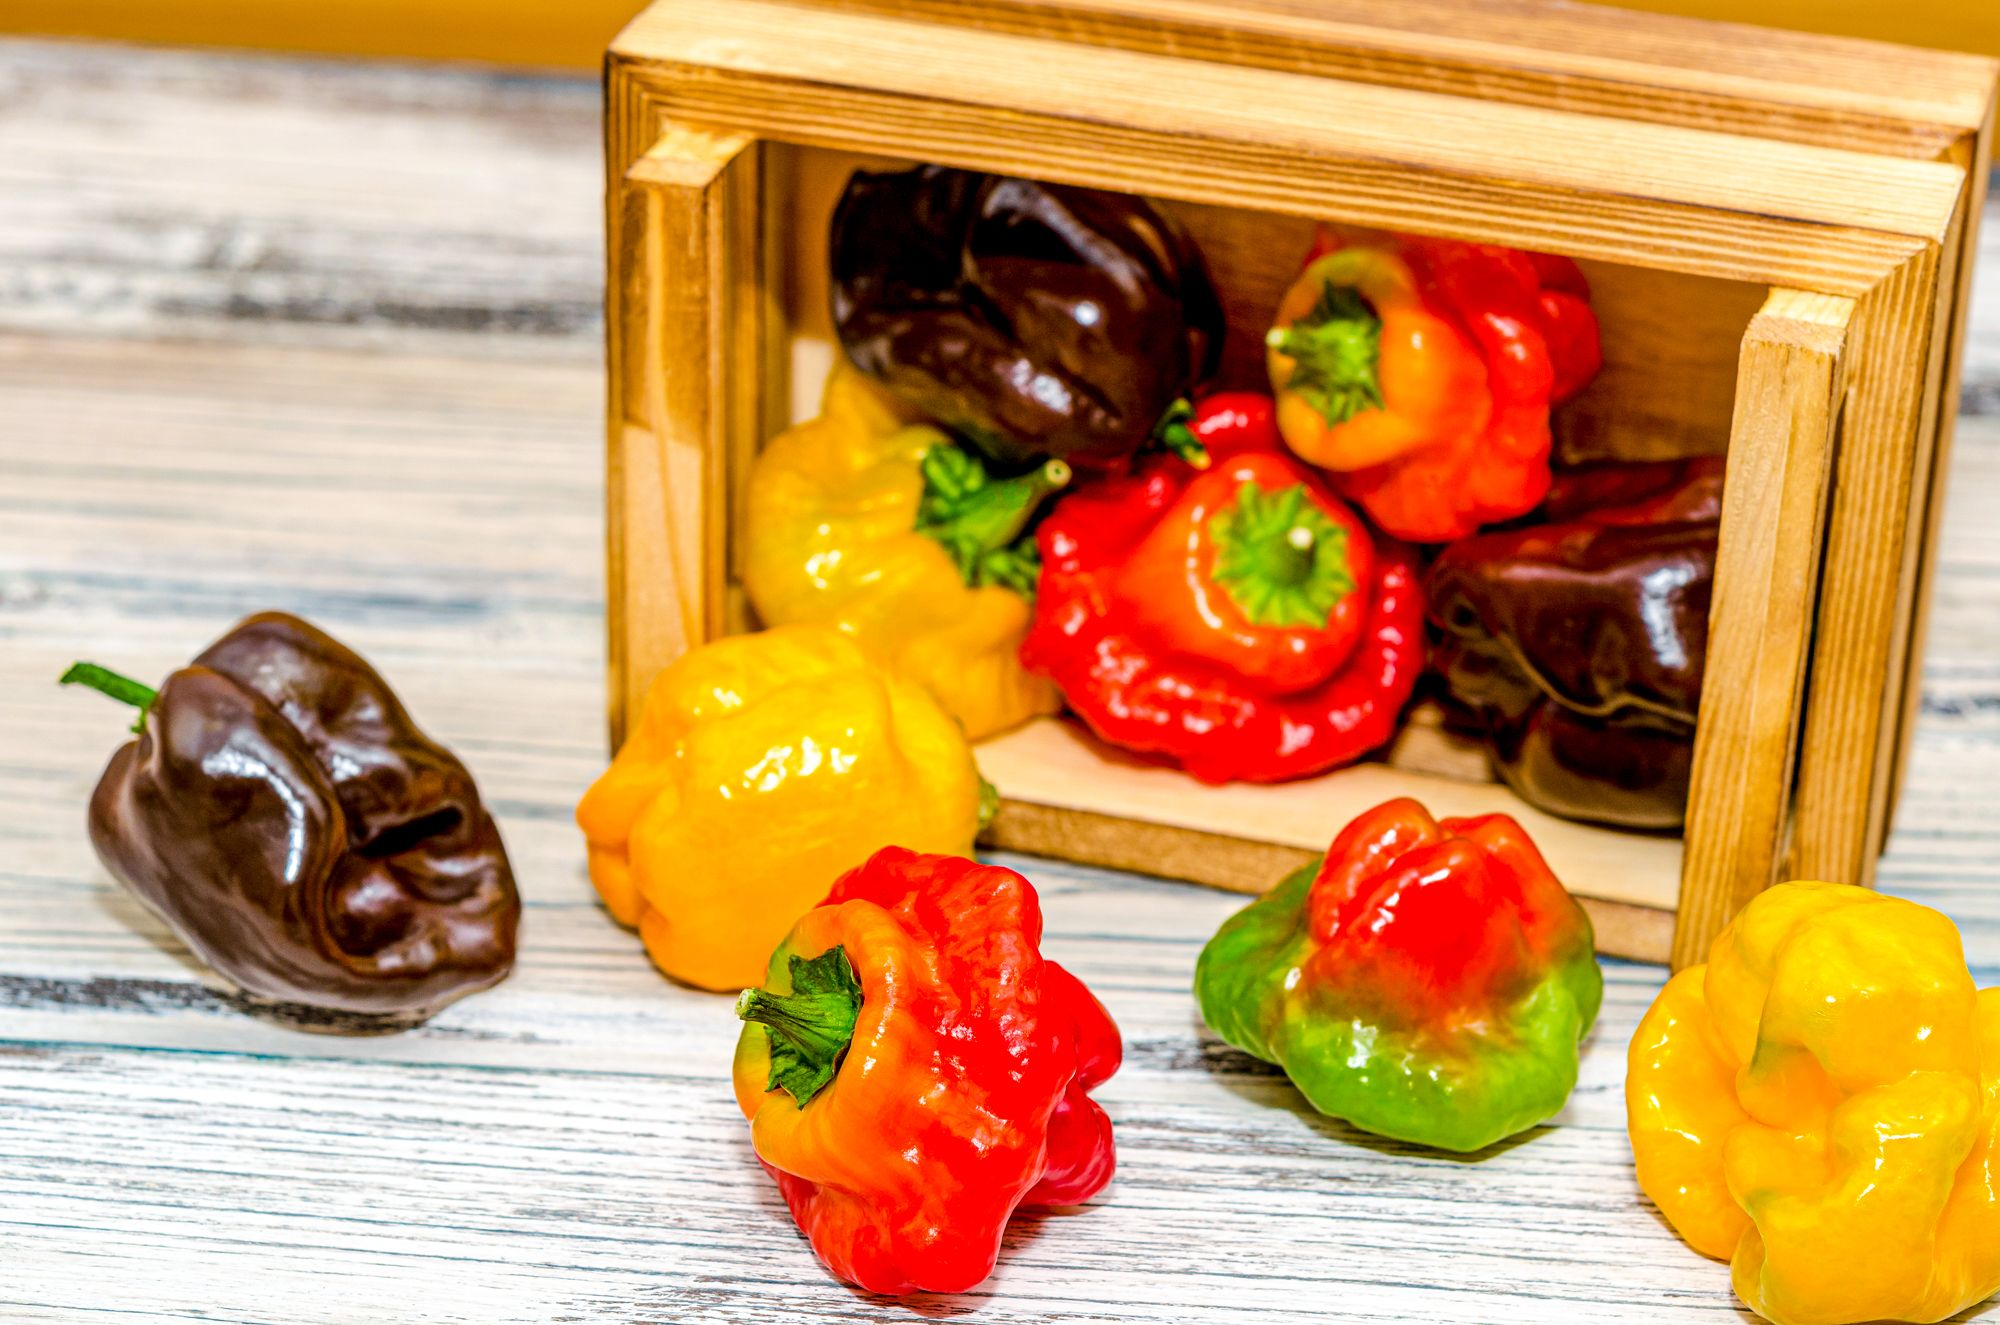 Antigua Hot Sauce Chili Peppers